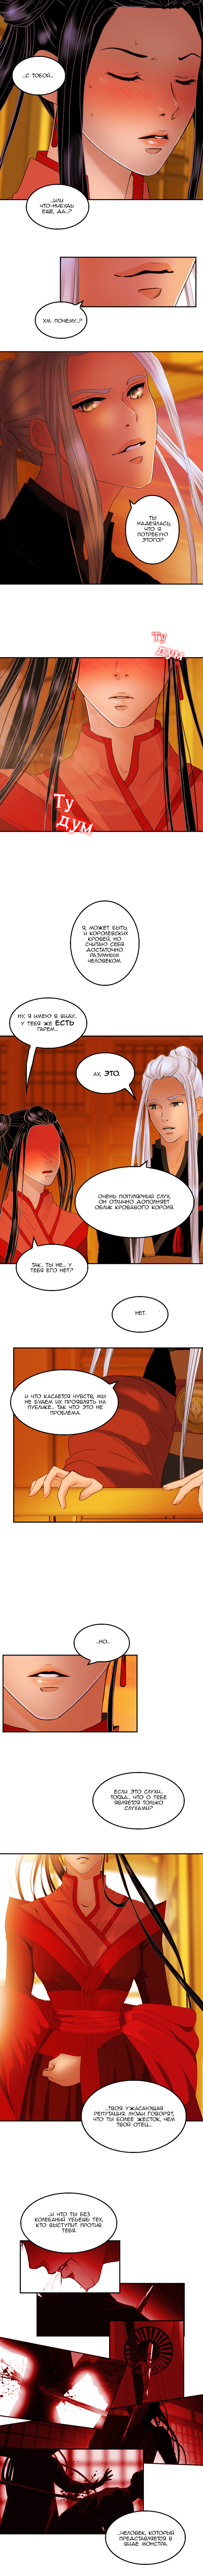 https://r1.ninemanga.com/comics/pic2/50/32242/329852/1500531060790.jpg Page 8